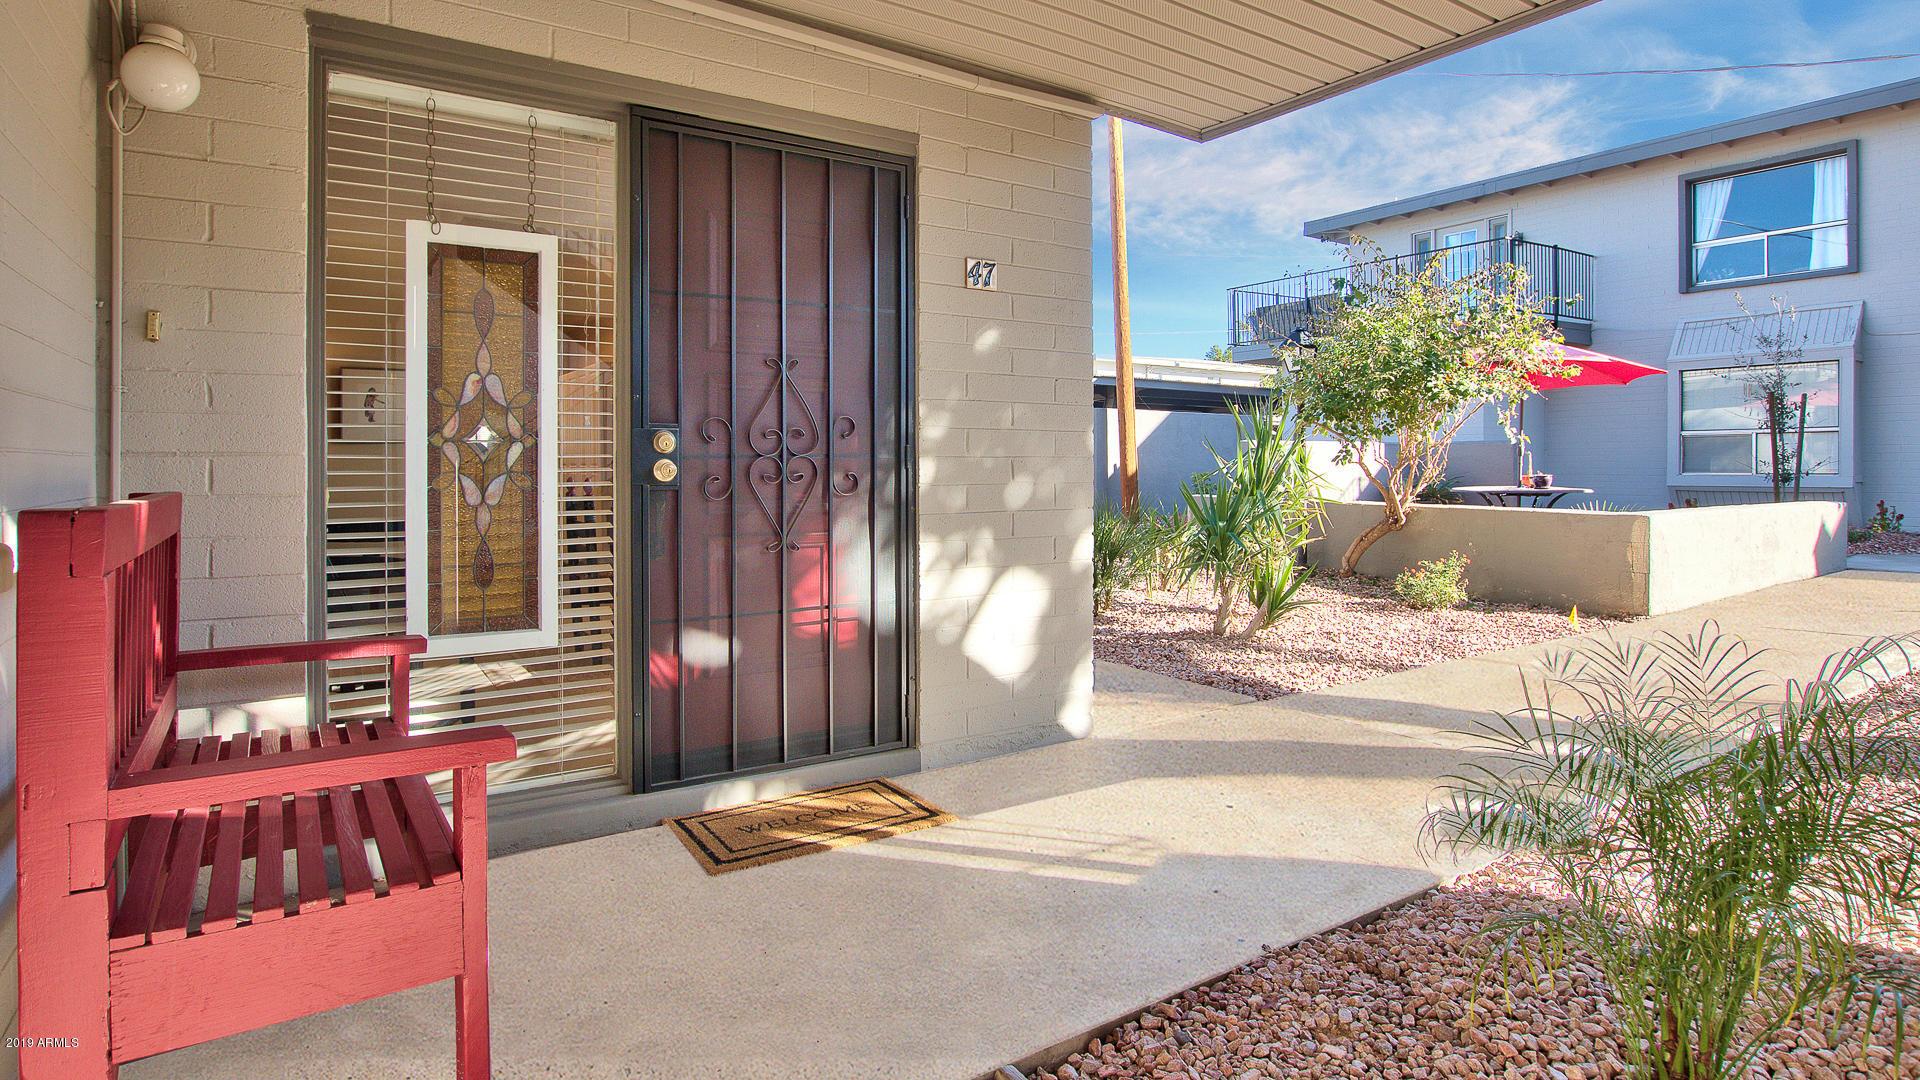 Photo of 4114 E CALLE REDONDA -- E #47, Phoenix, AZ 85018